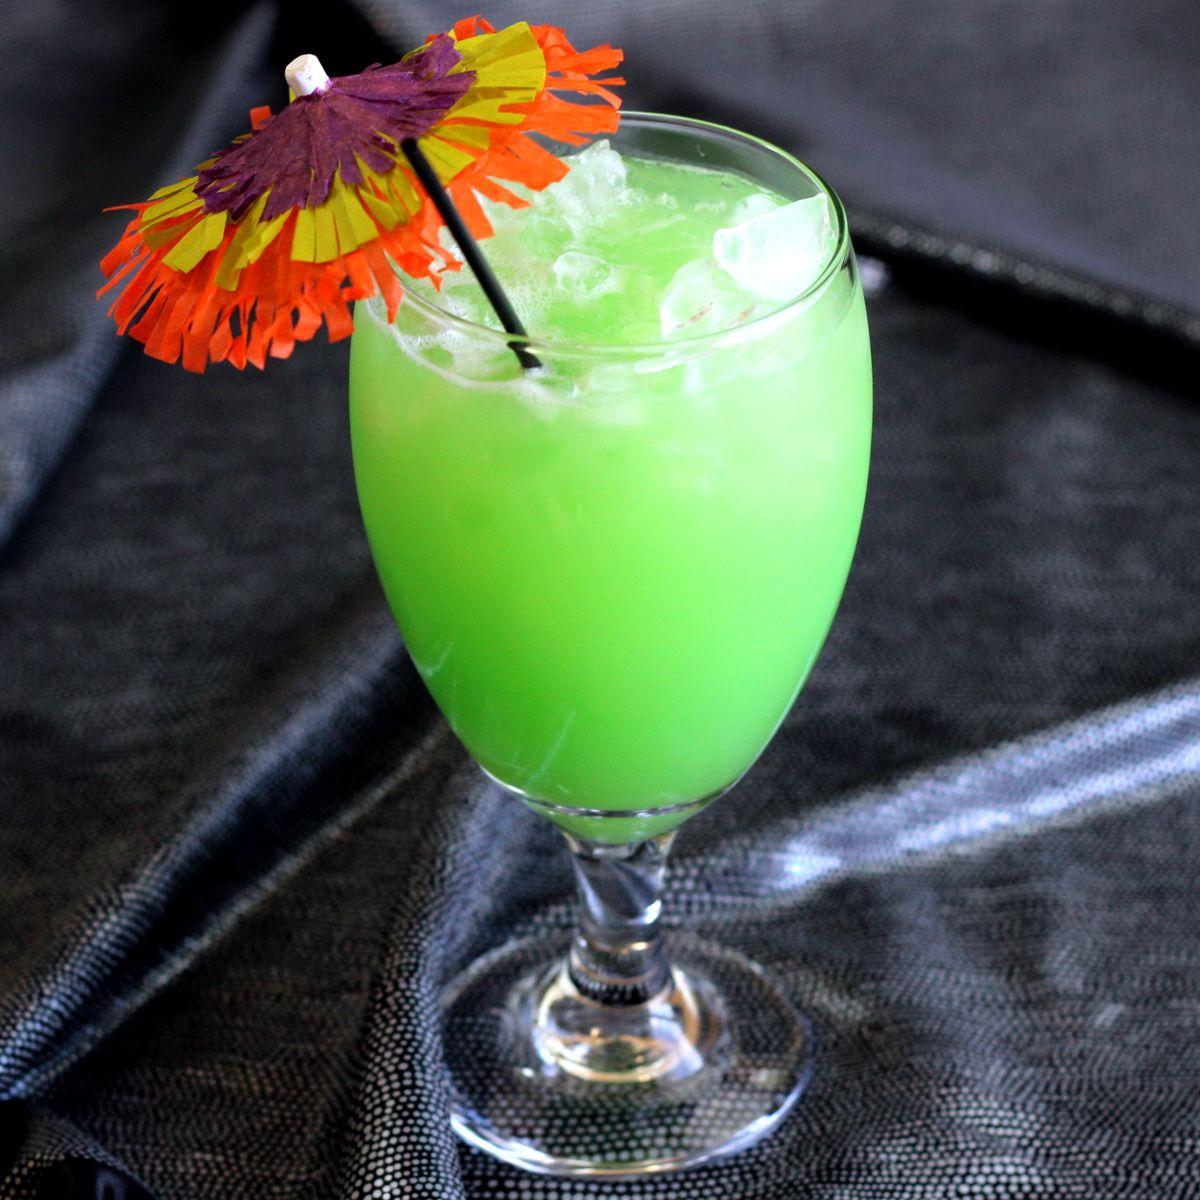 Green Eyes Drink Recipe: Rum, Midori, Coconut Cream